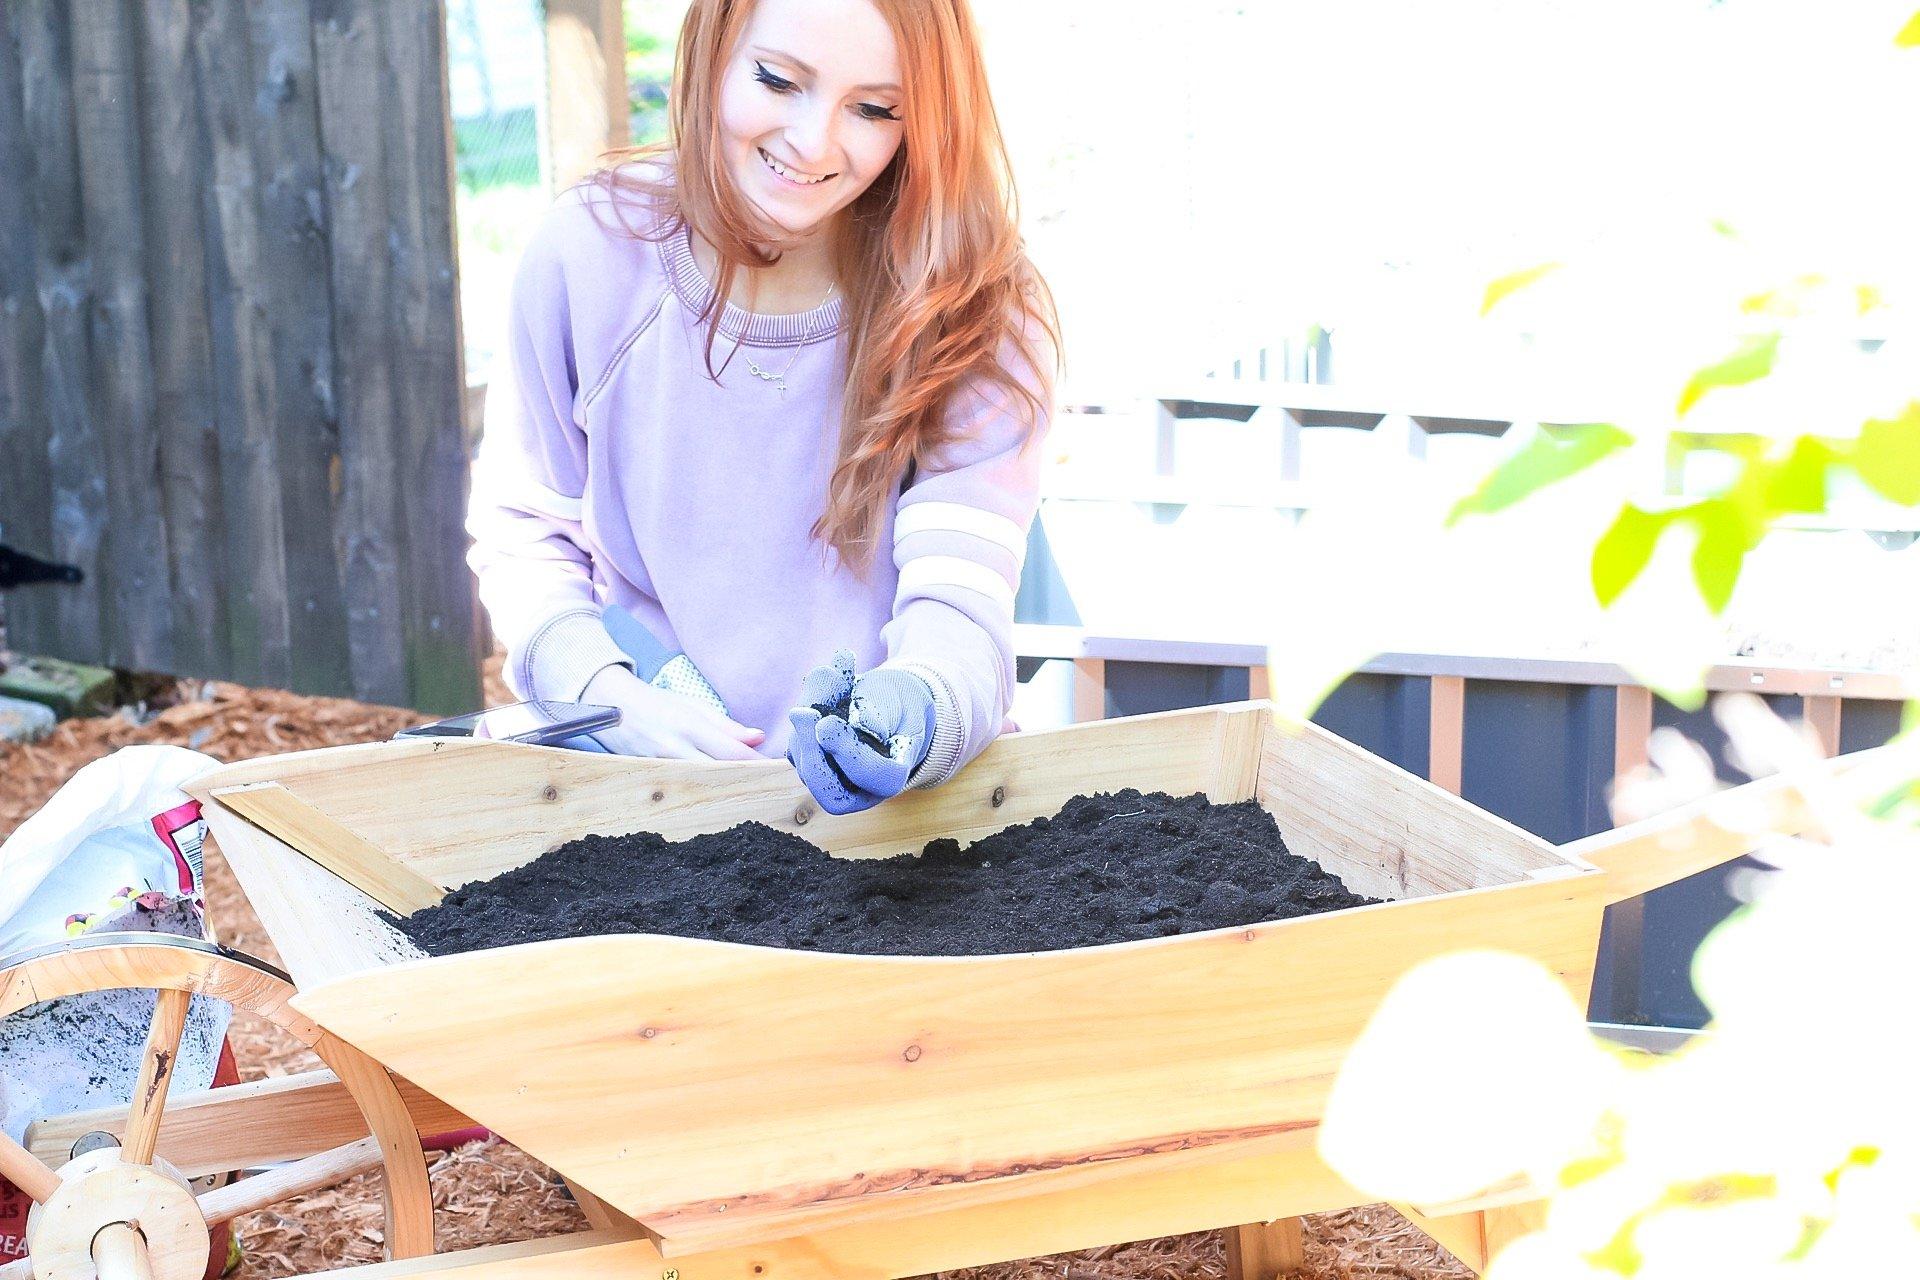 Setting Up Our Garden + 10 Easy Gardening Tips